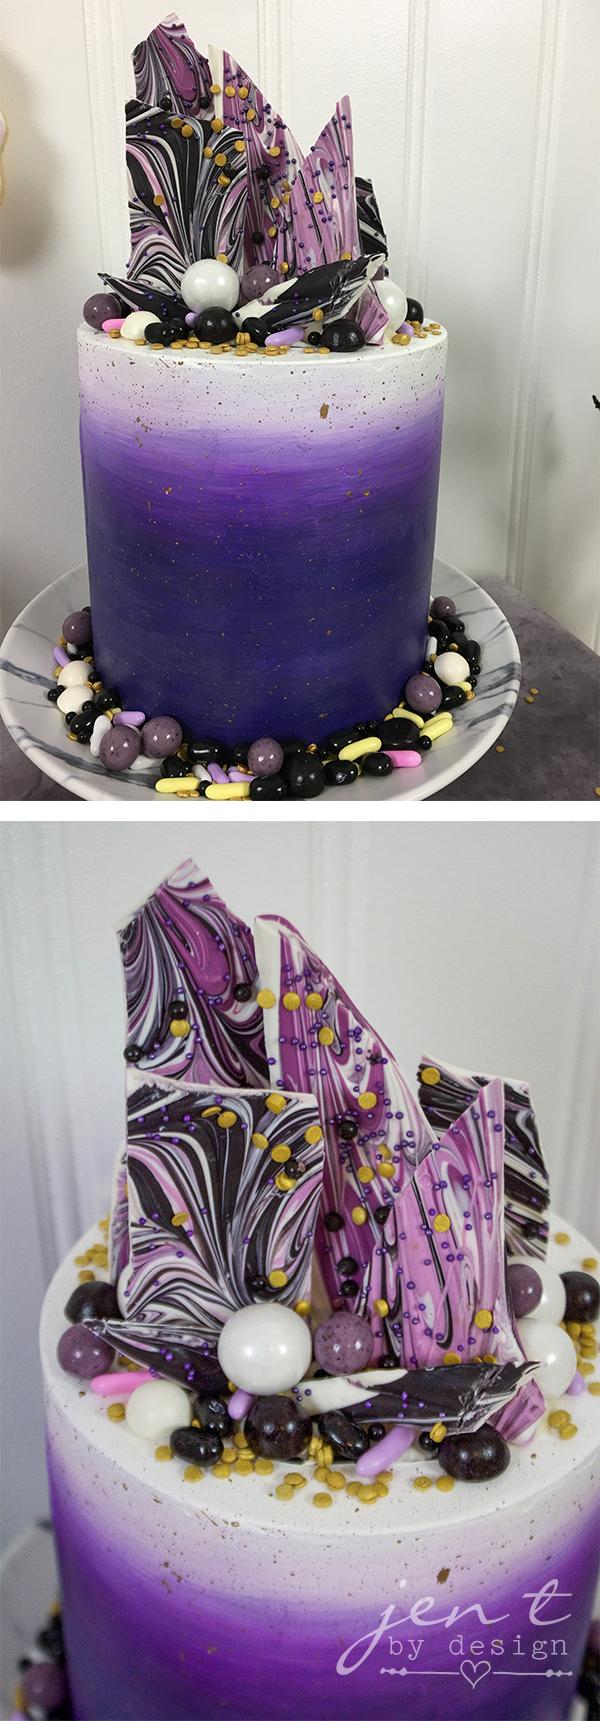 Bat Halloween Party - Halloween Cake - Jen T by Design.jpg